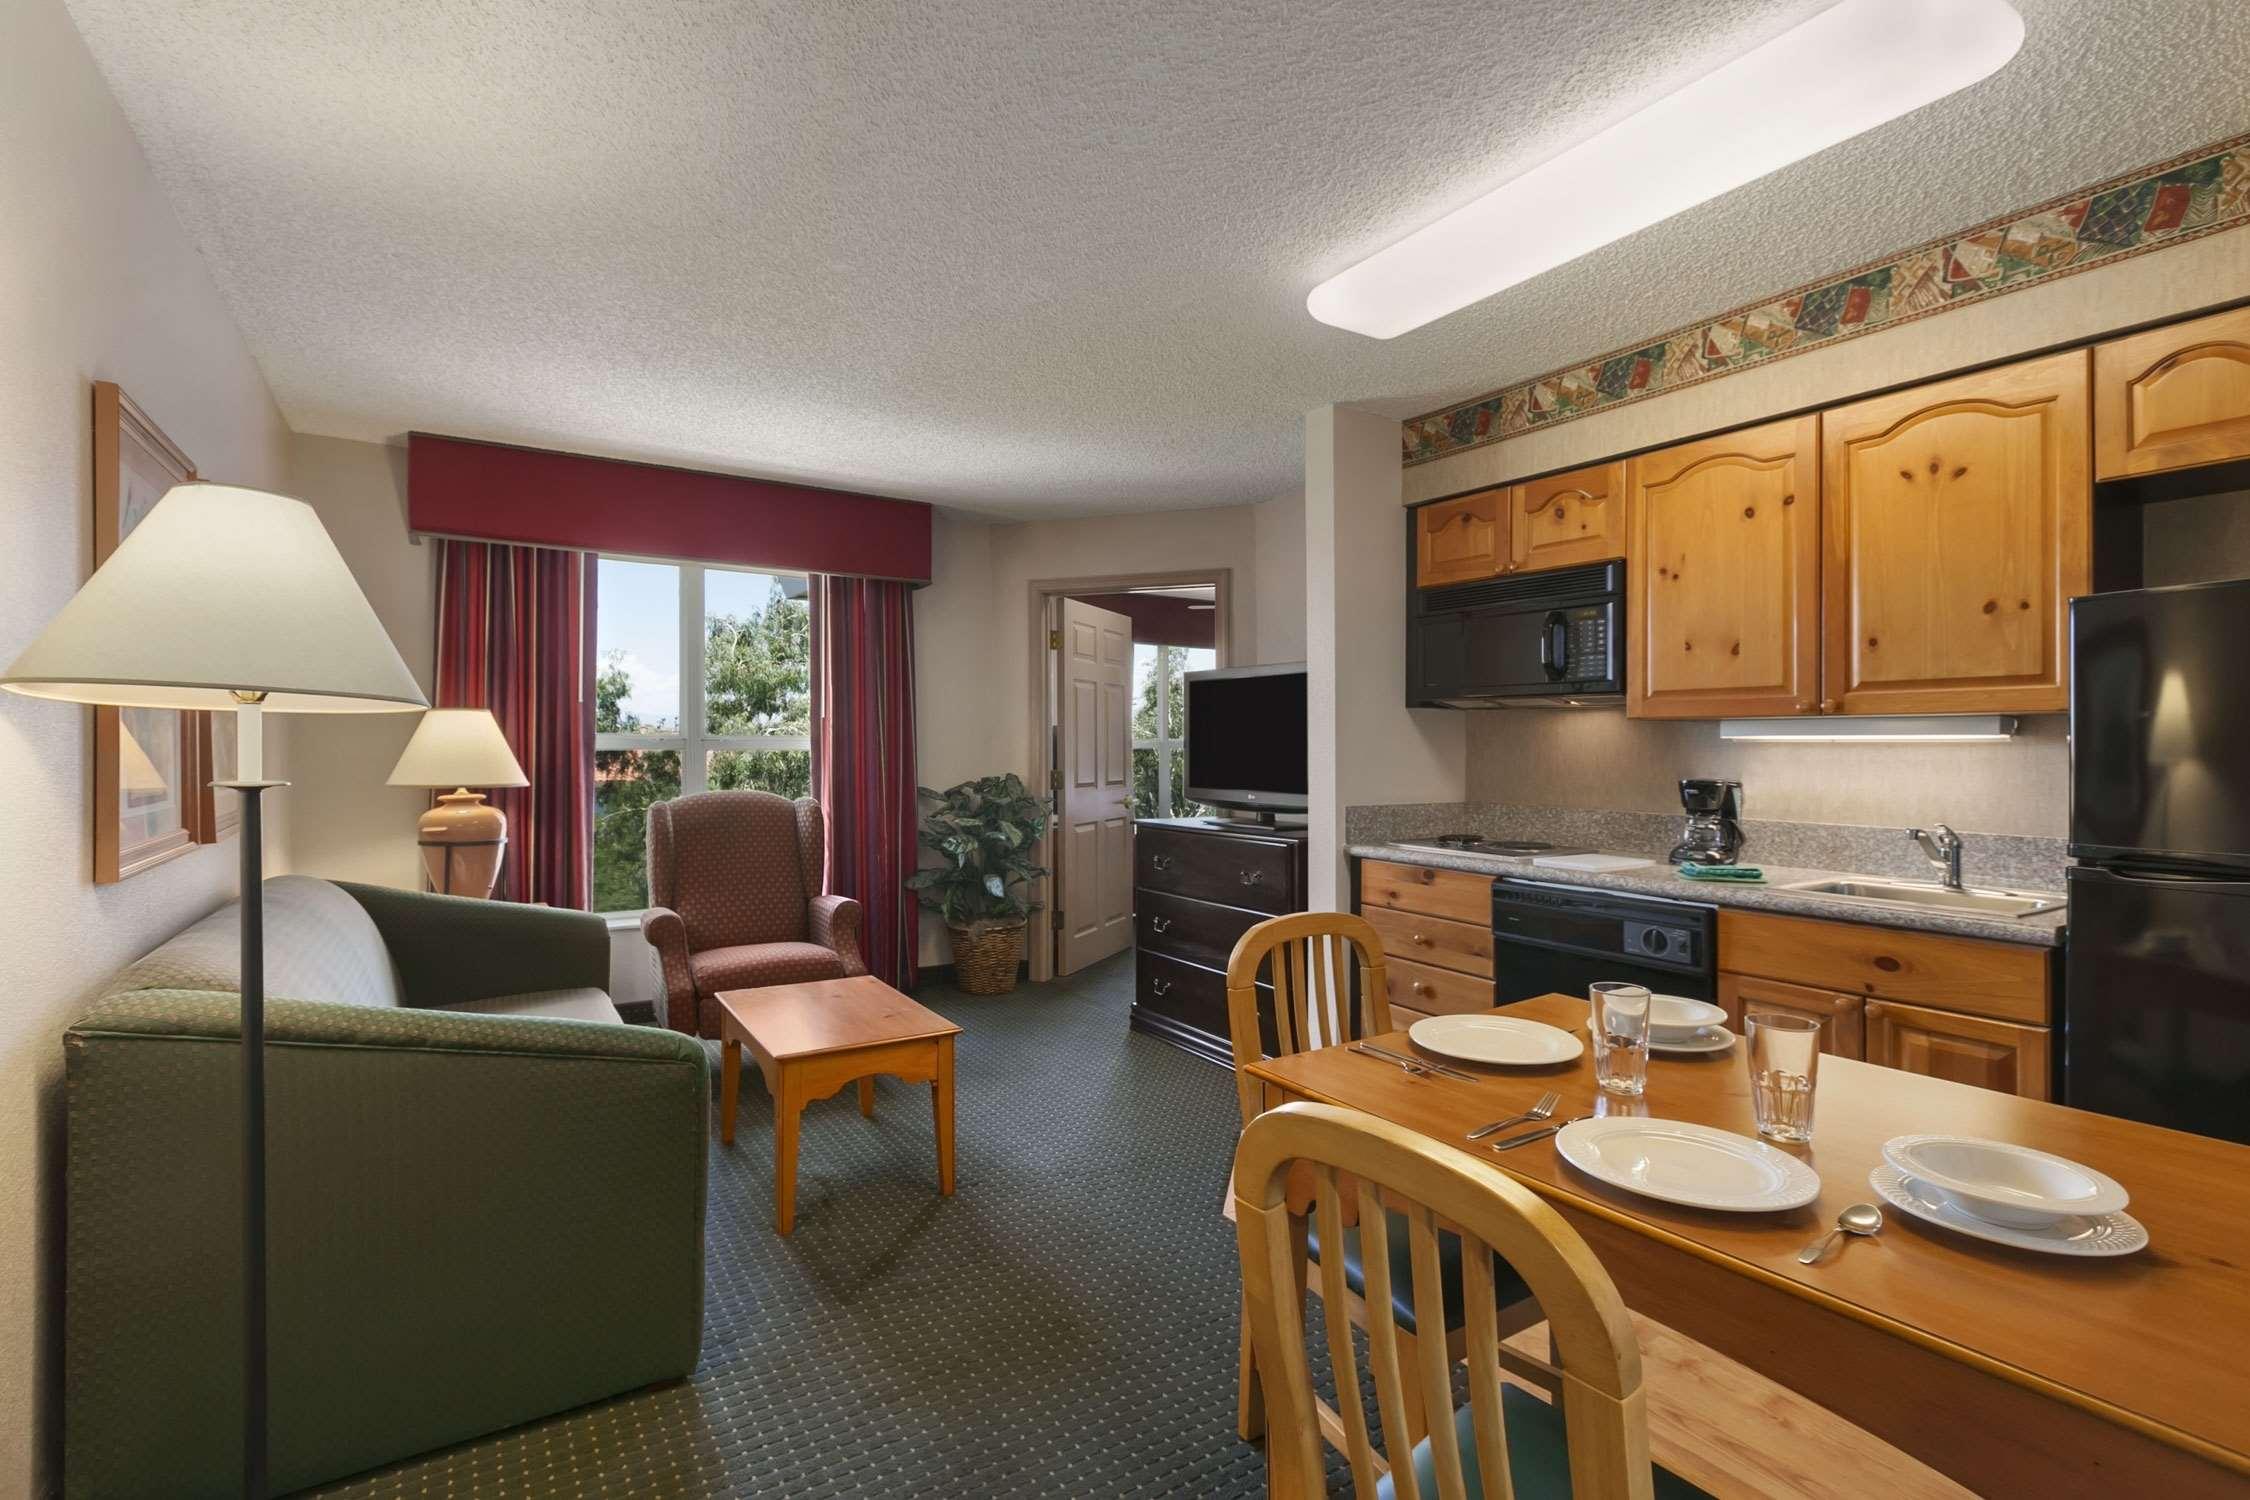 Homewood Suites by Hilton Phoenix/Scottsdale image 8